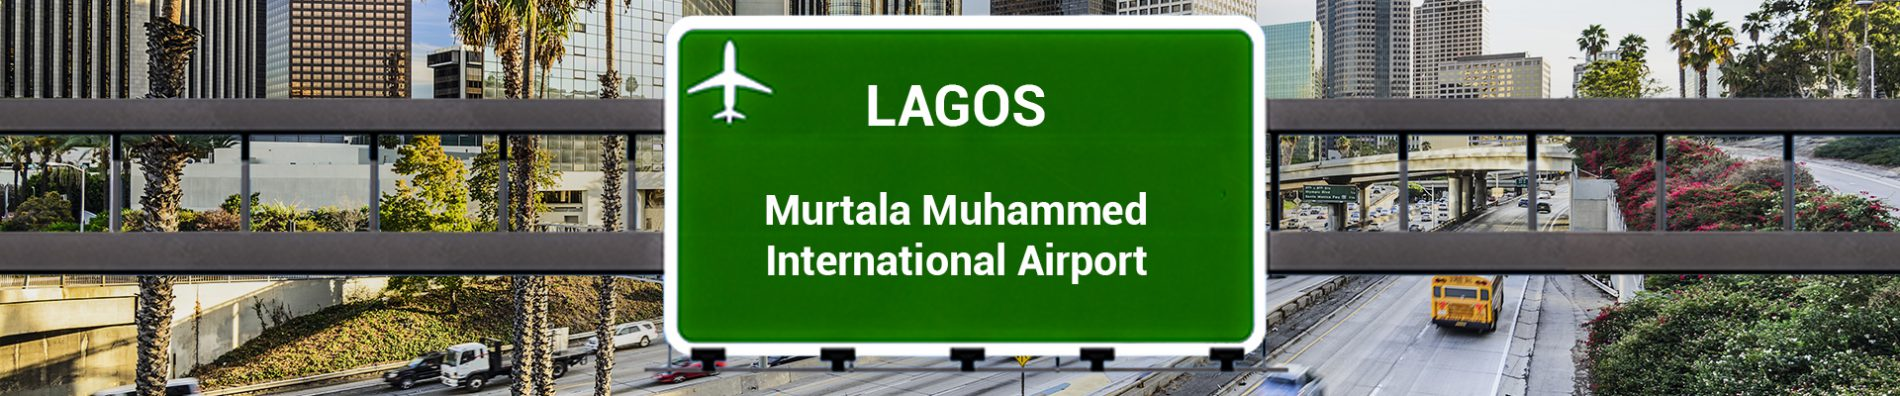 Internacional Airport Murtala Muhammed